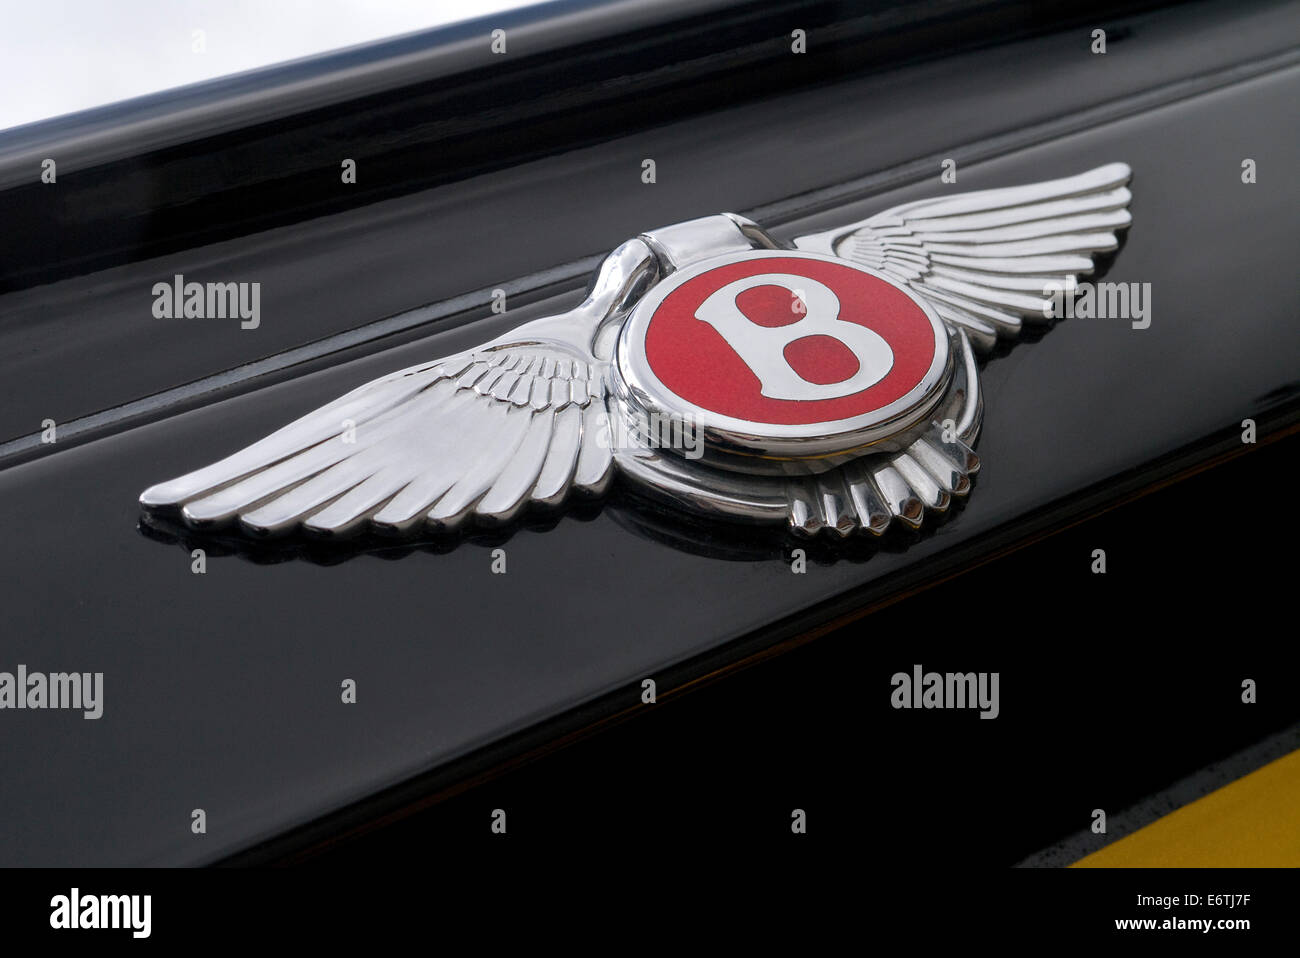 Bentley Continental SC 1999 - Stock Image